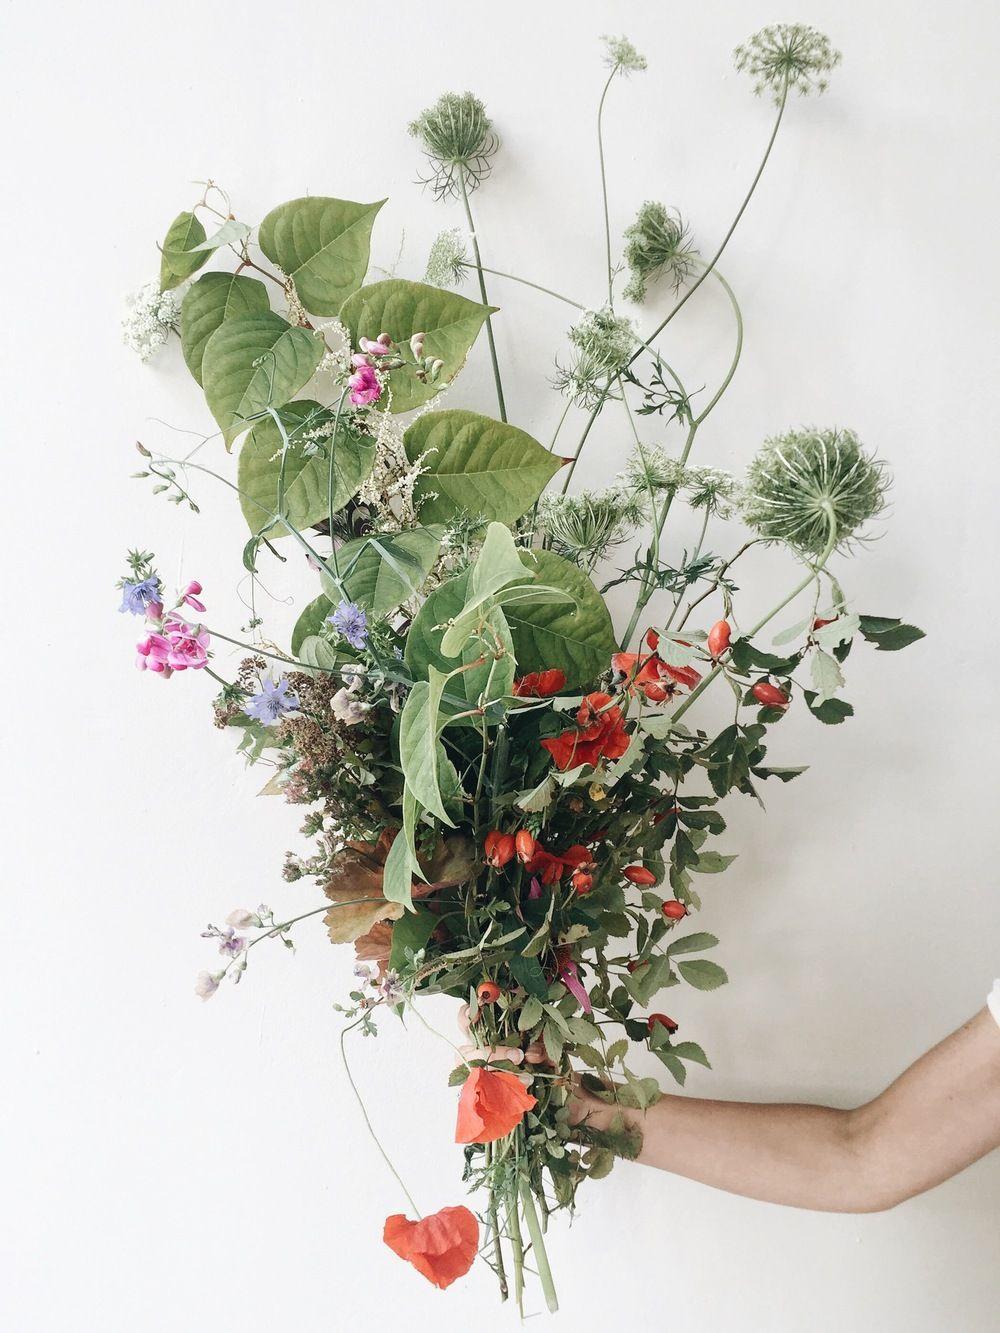 Amy Merrick L O V E L Y Blumen Blumenstrauss Blumen Wiese